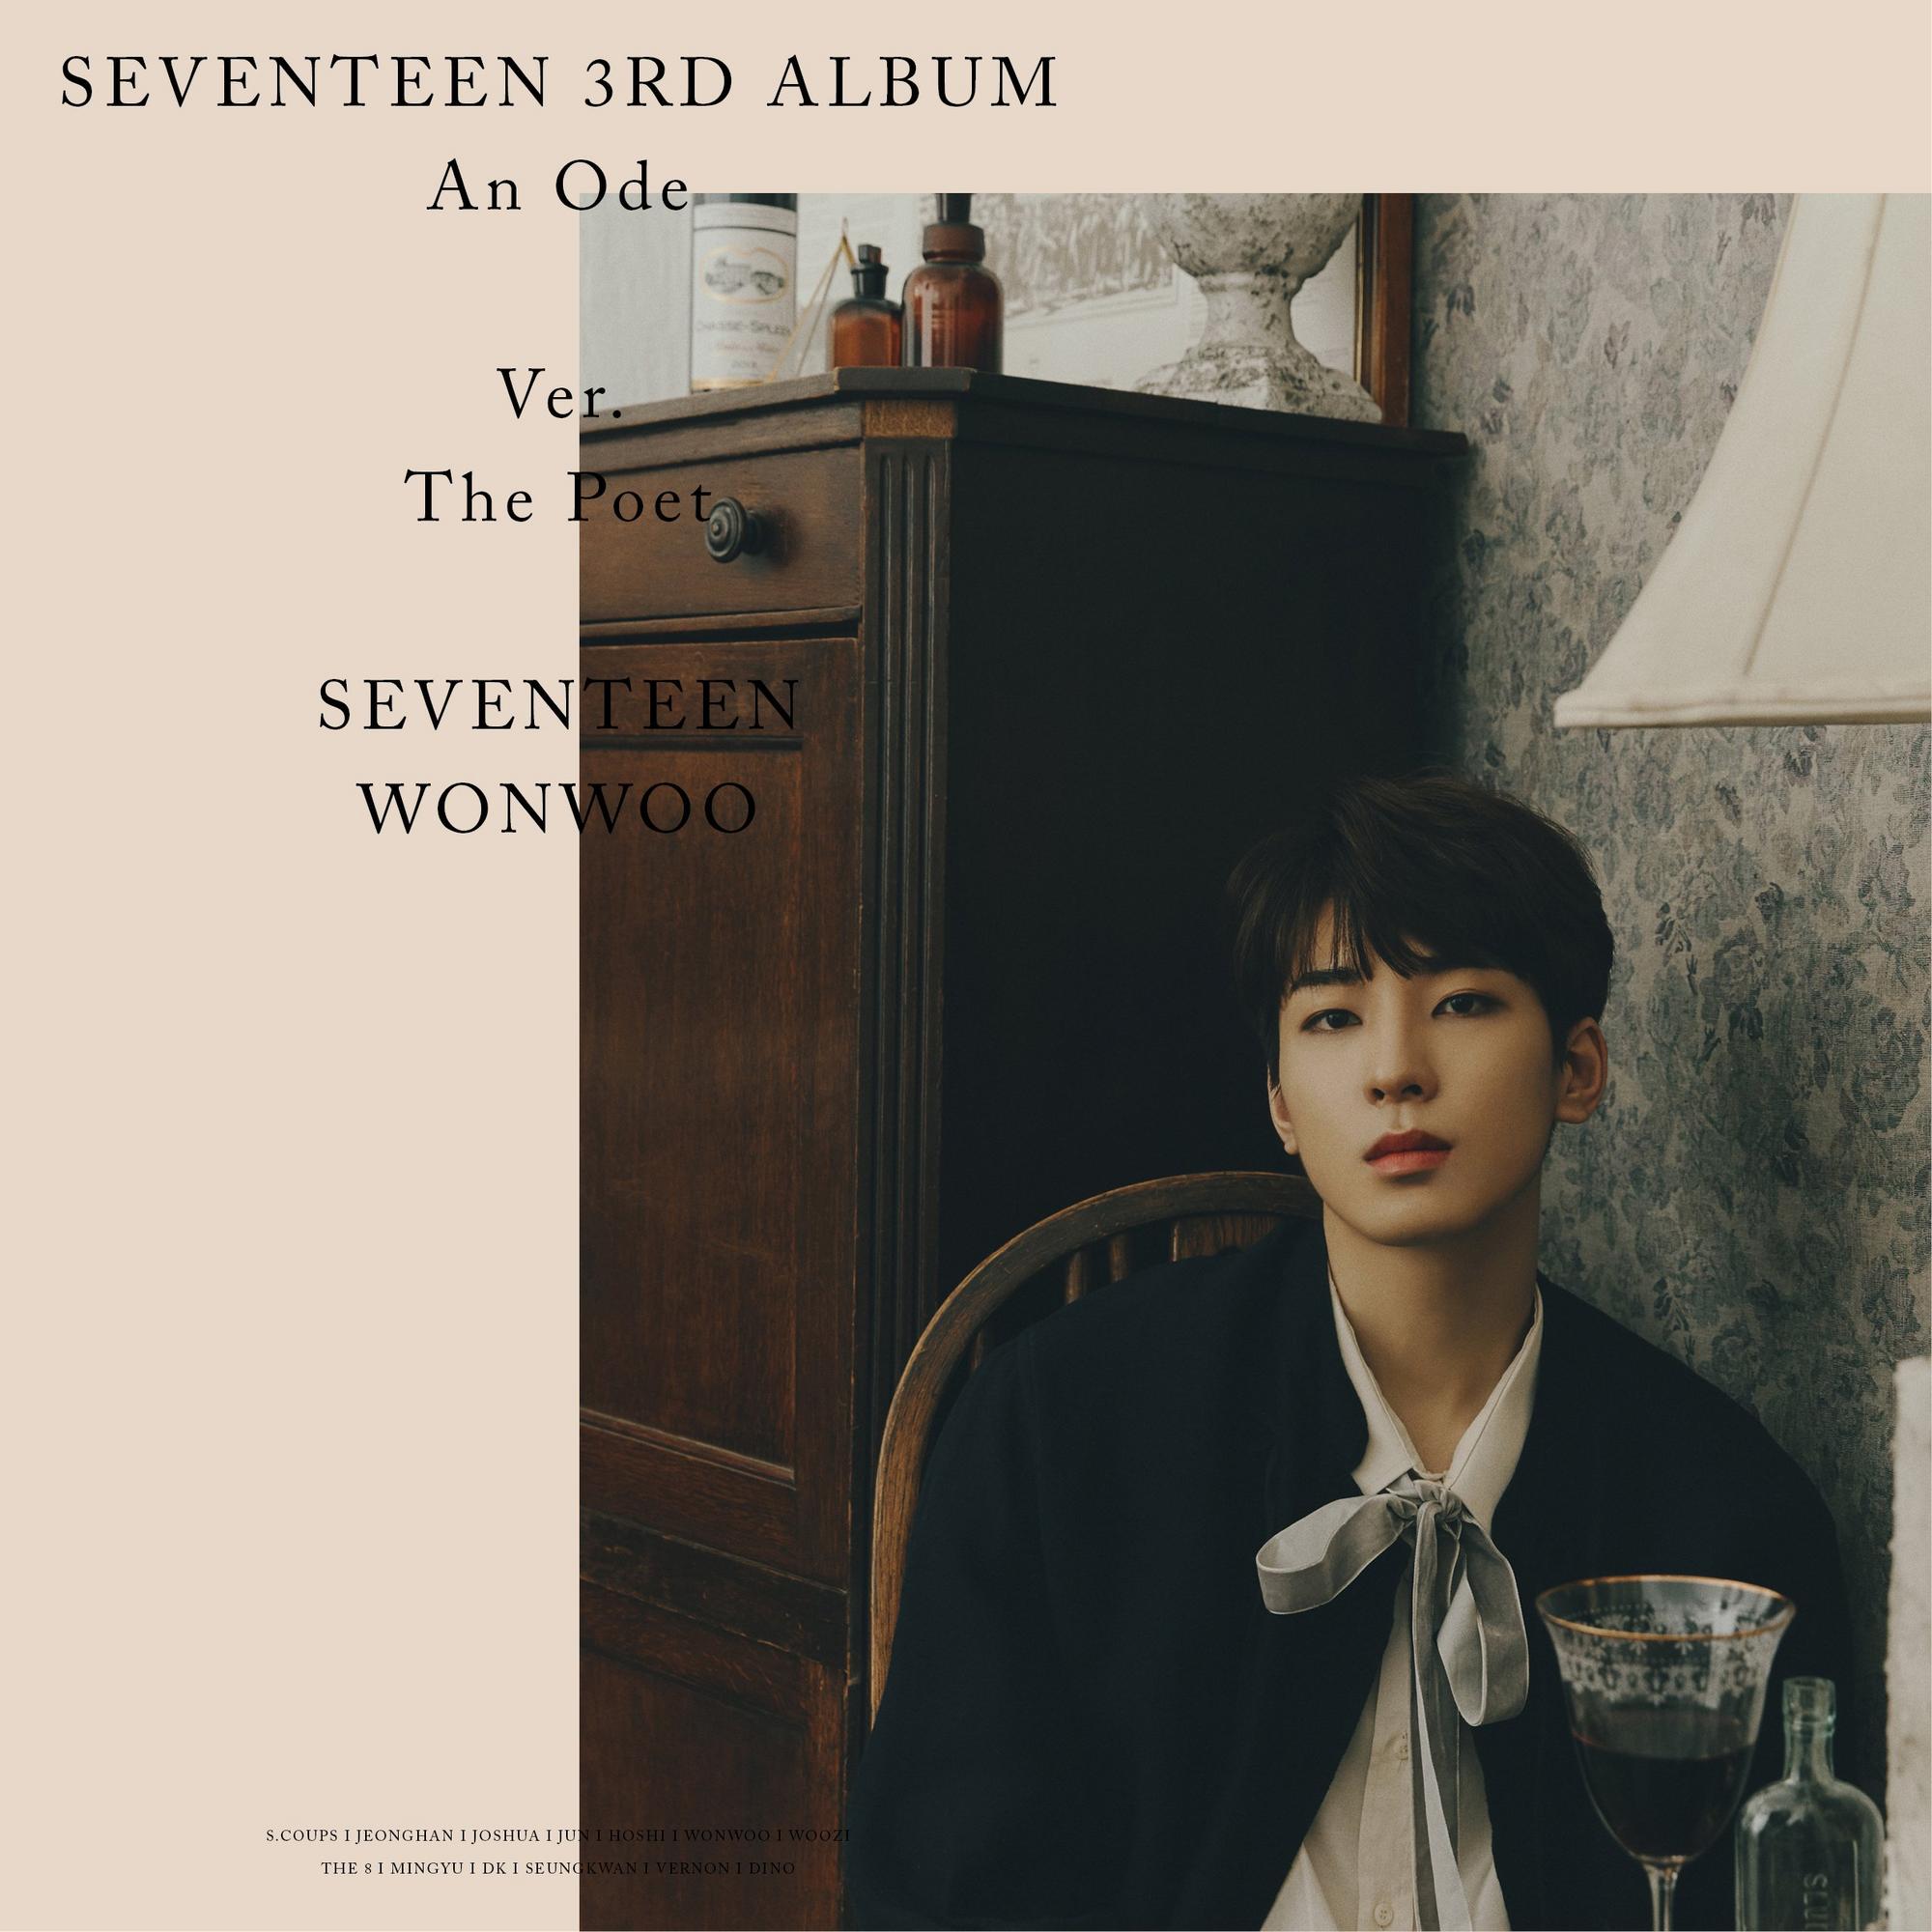 Wonwoo | Seventeen Wiki | FANDOM powered by Wikia